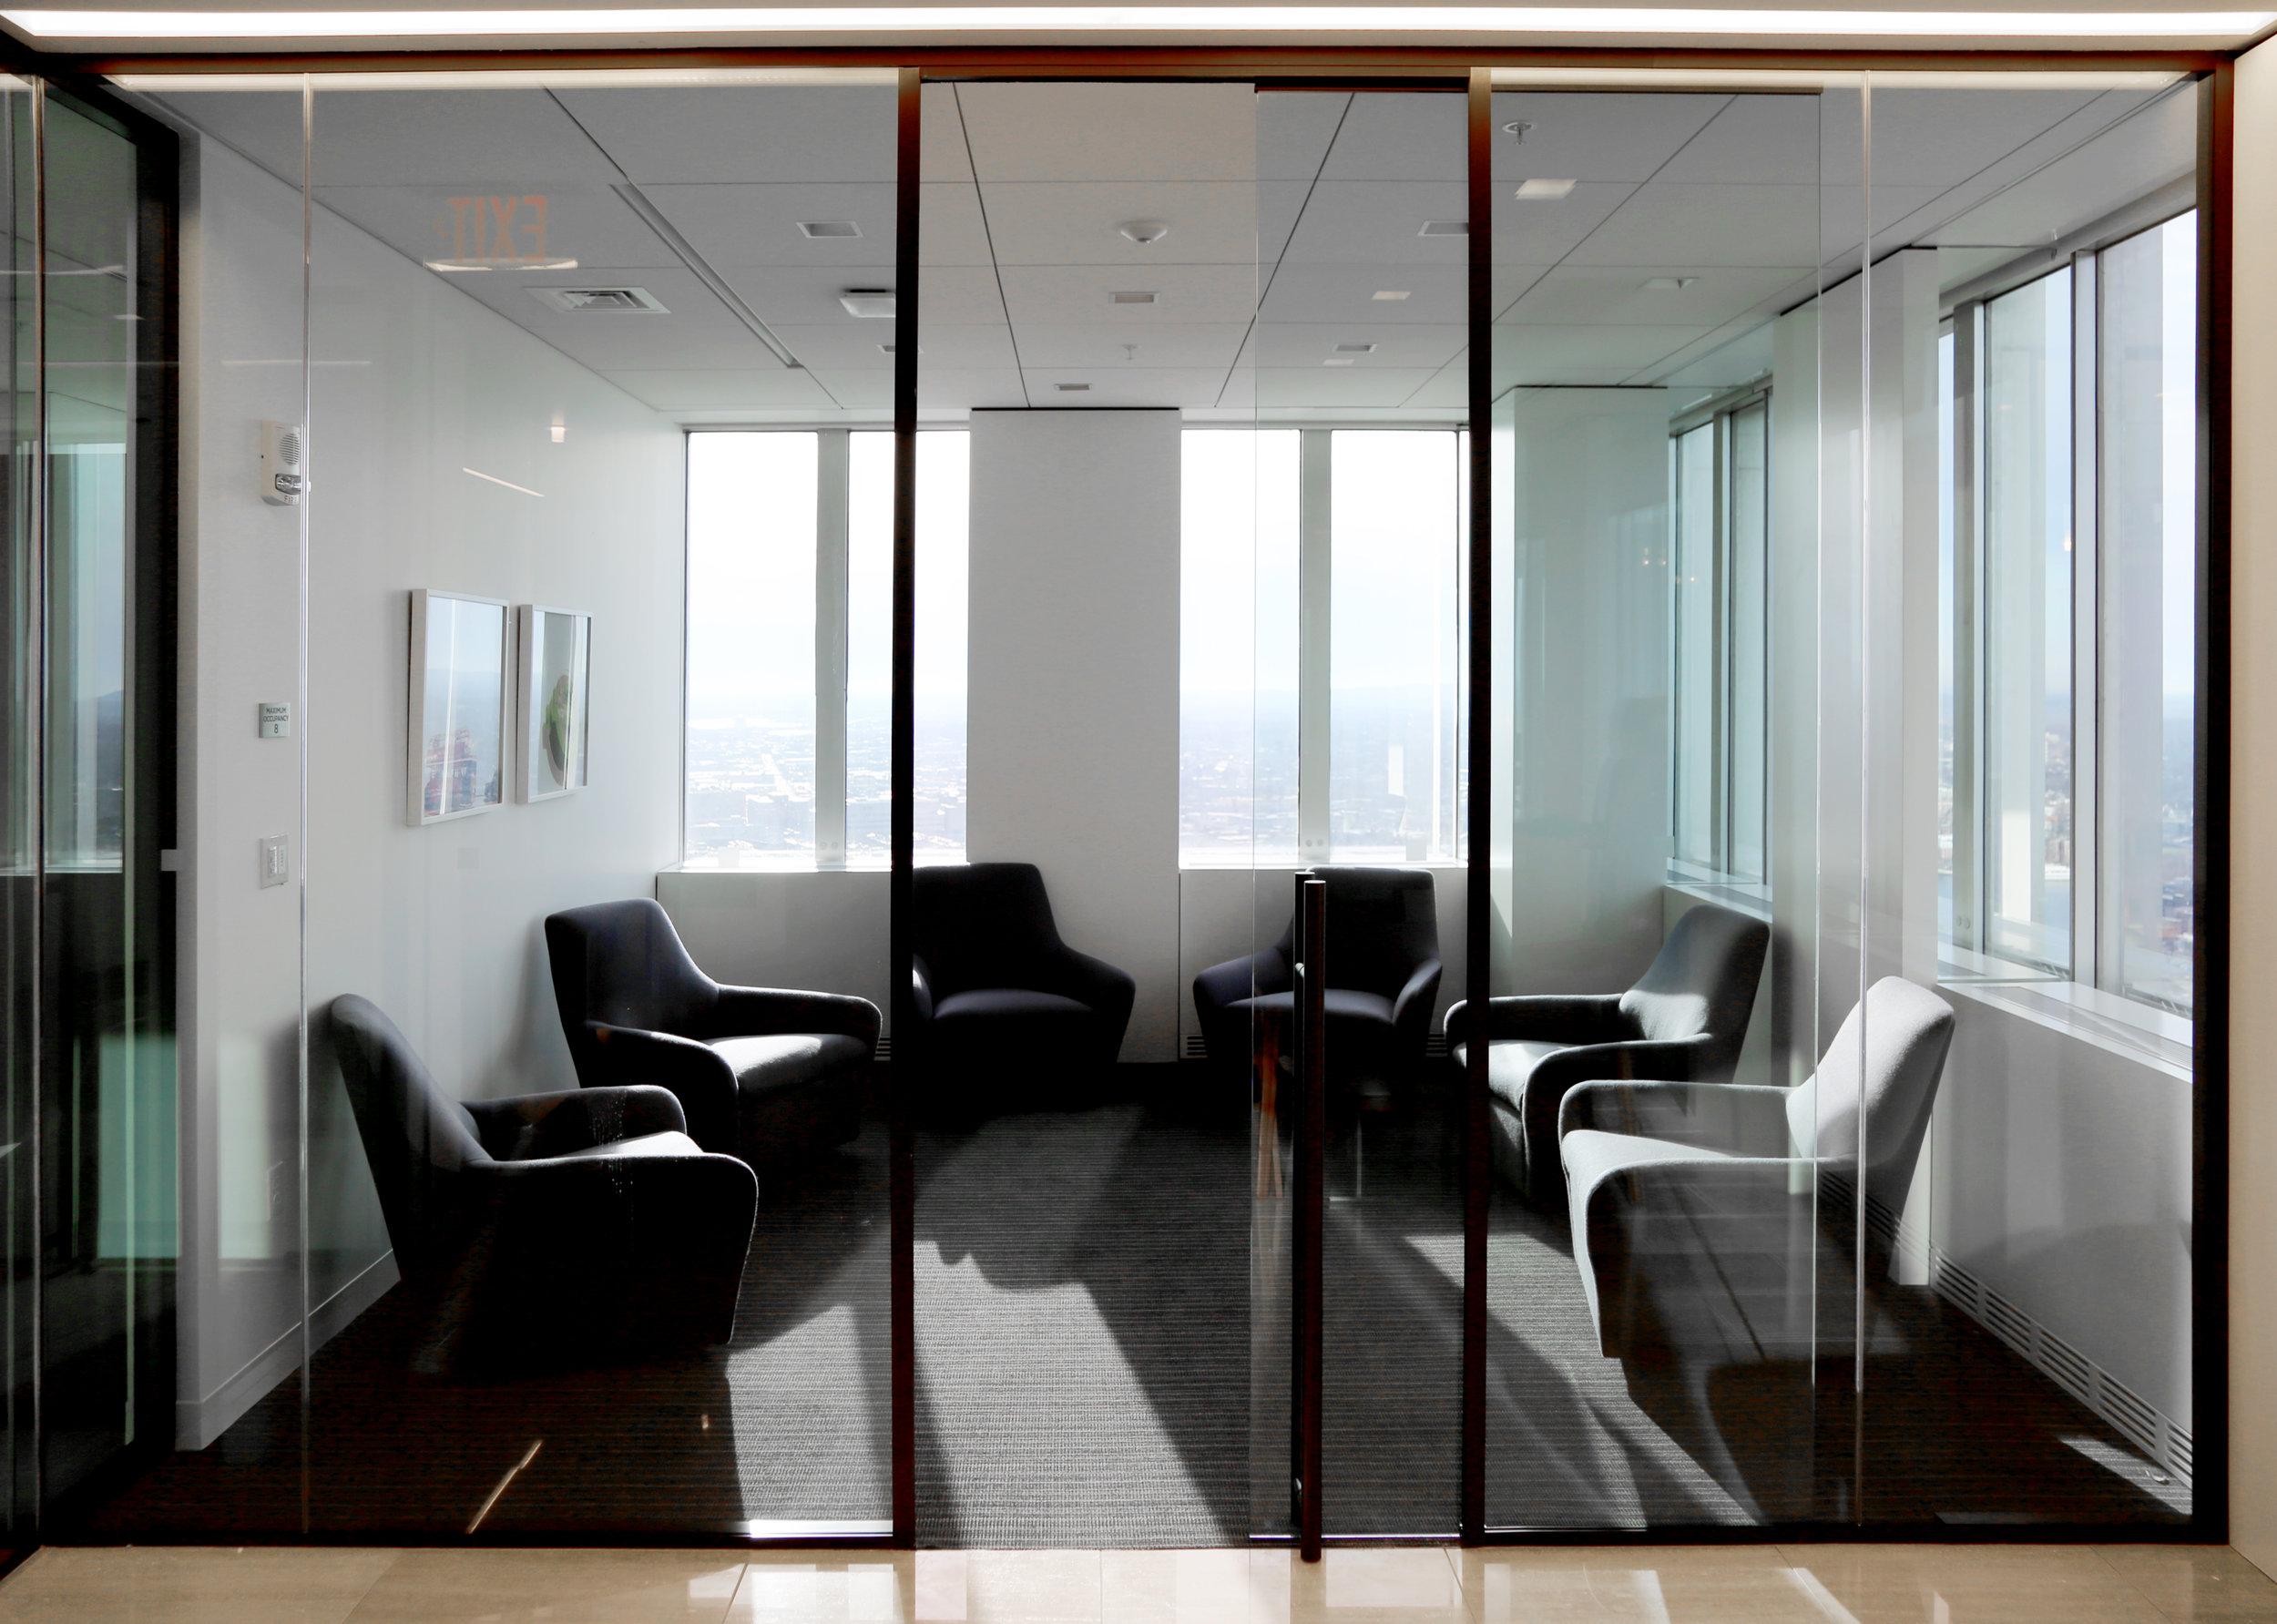 MODERNUS - An elegant Italian framing system with unique finish options and a sleek side-glazed aluminum profile.